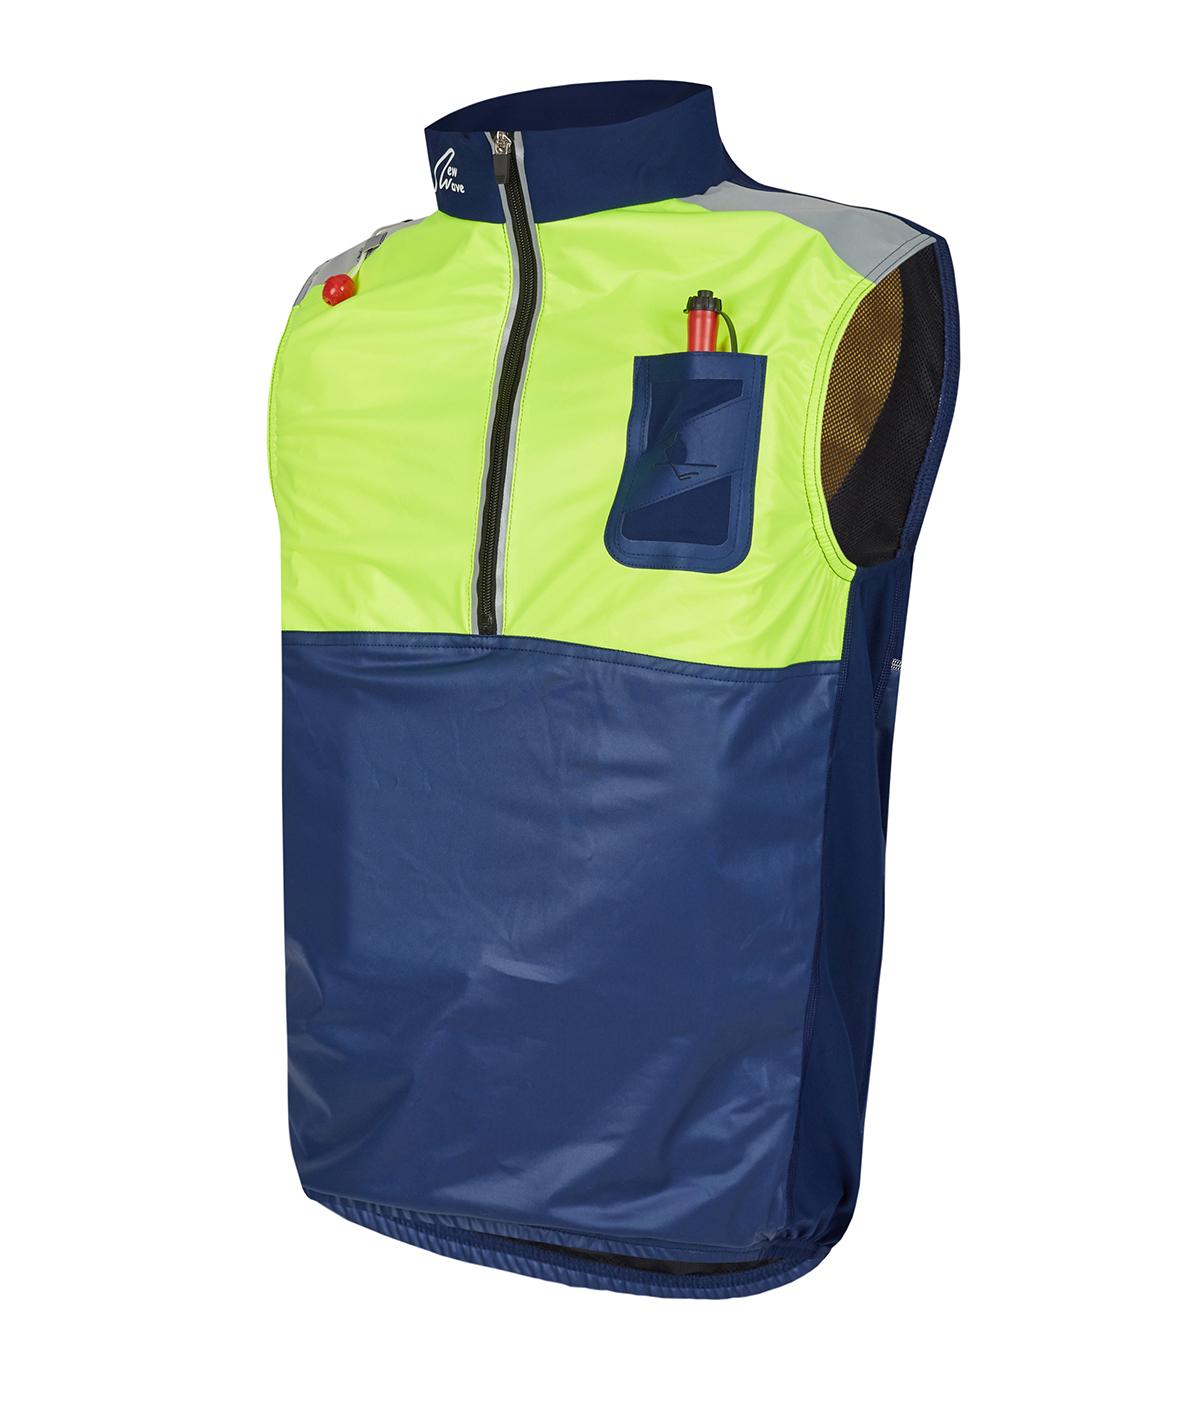 Row Life Vest - marine / gelb